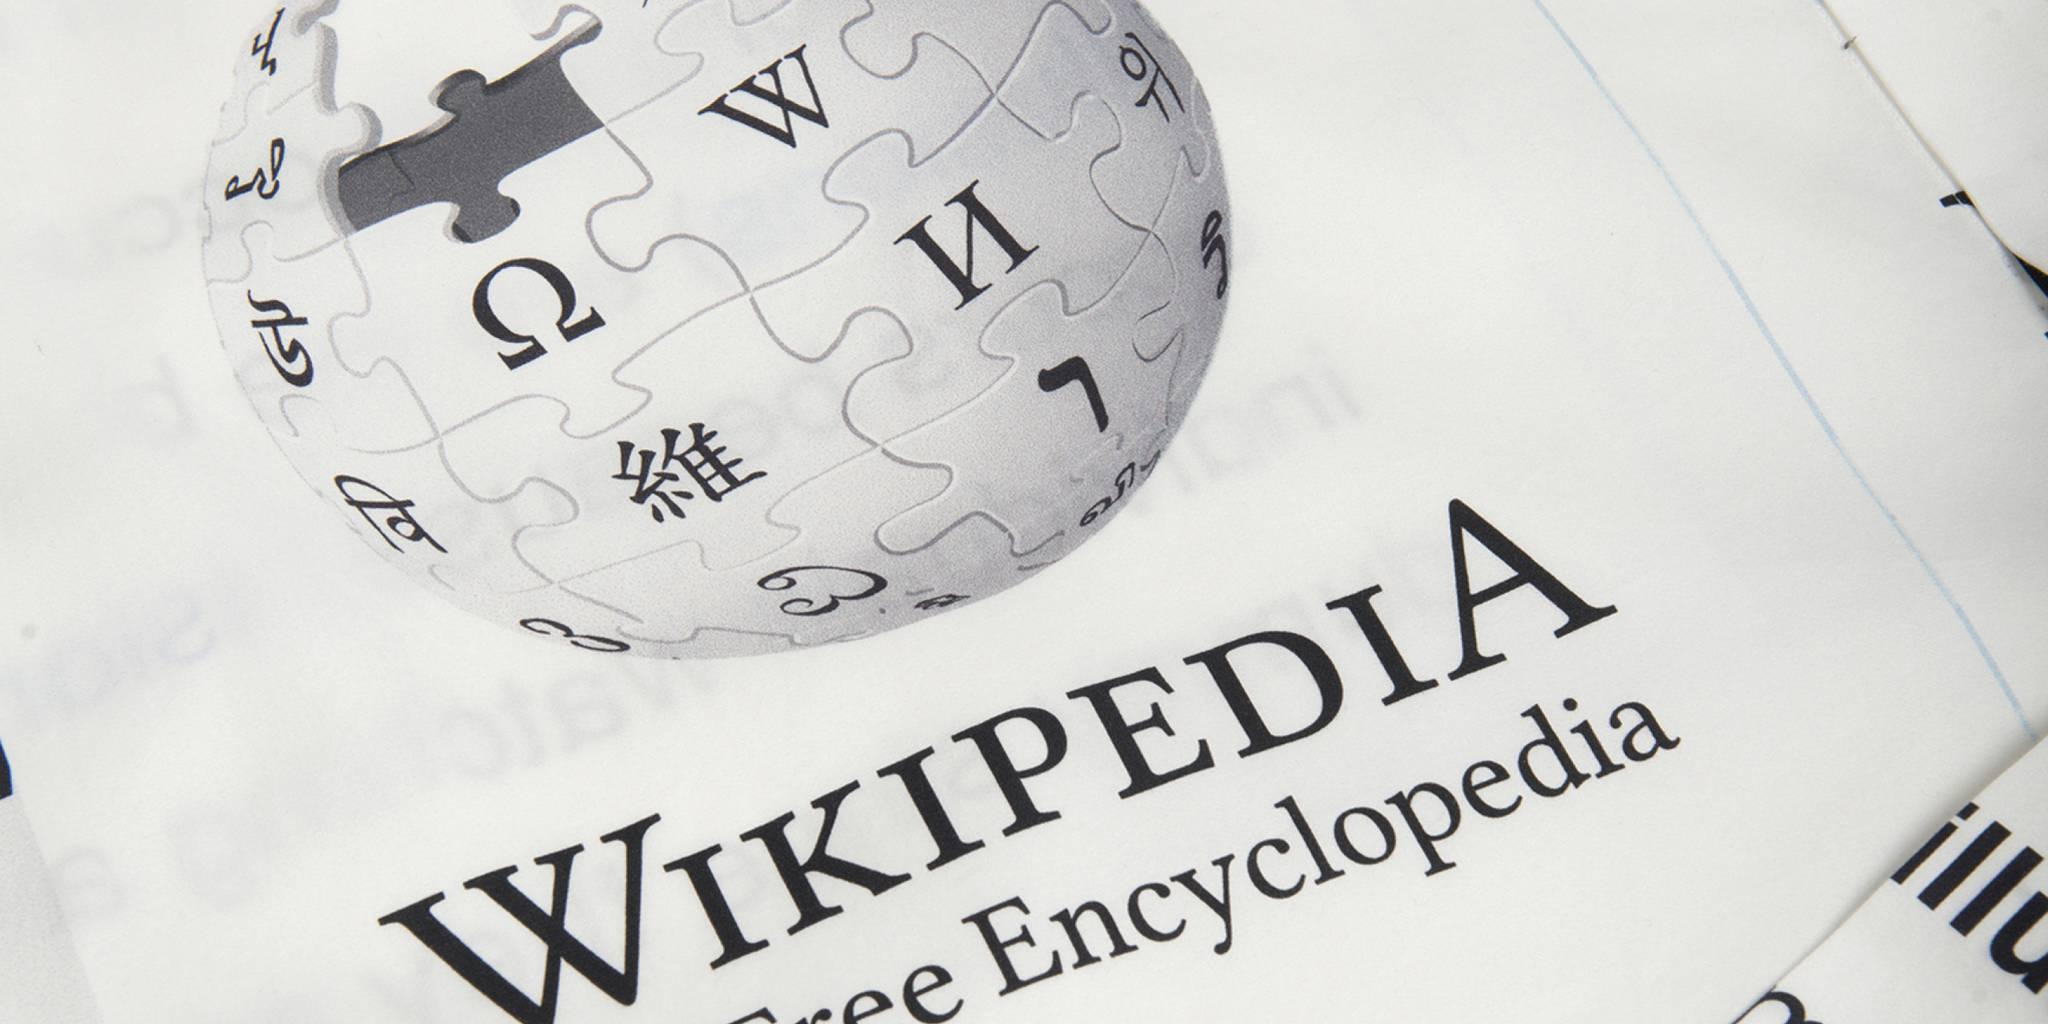 Etudes x Wikiperdia